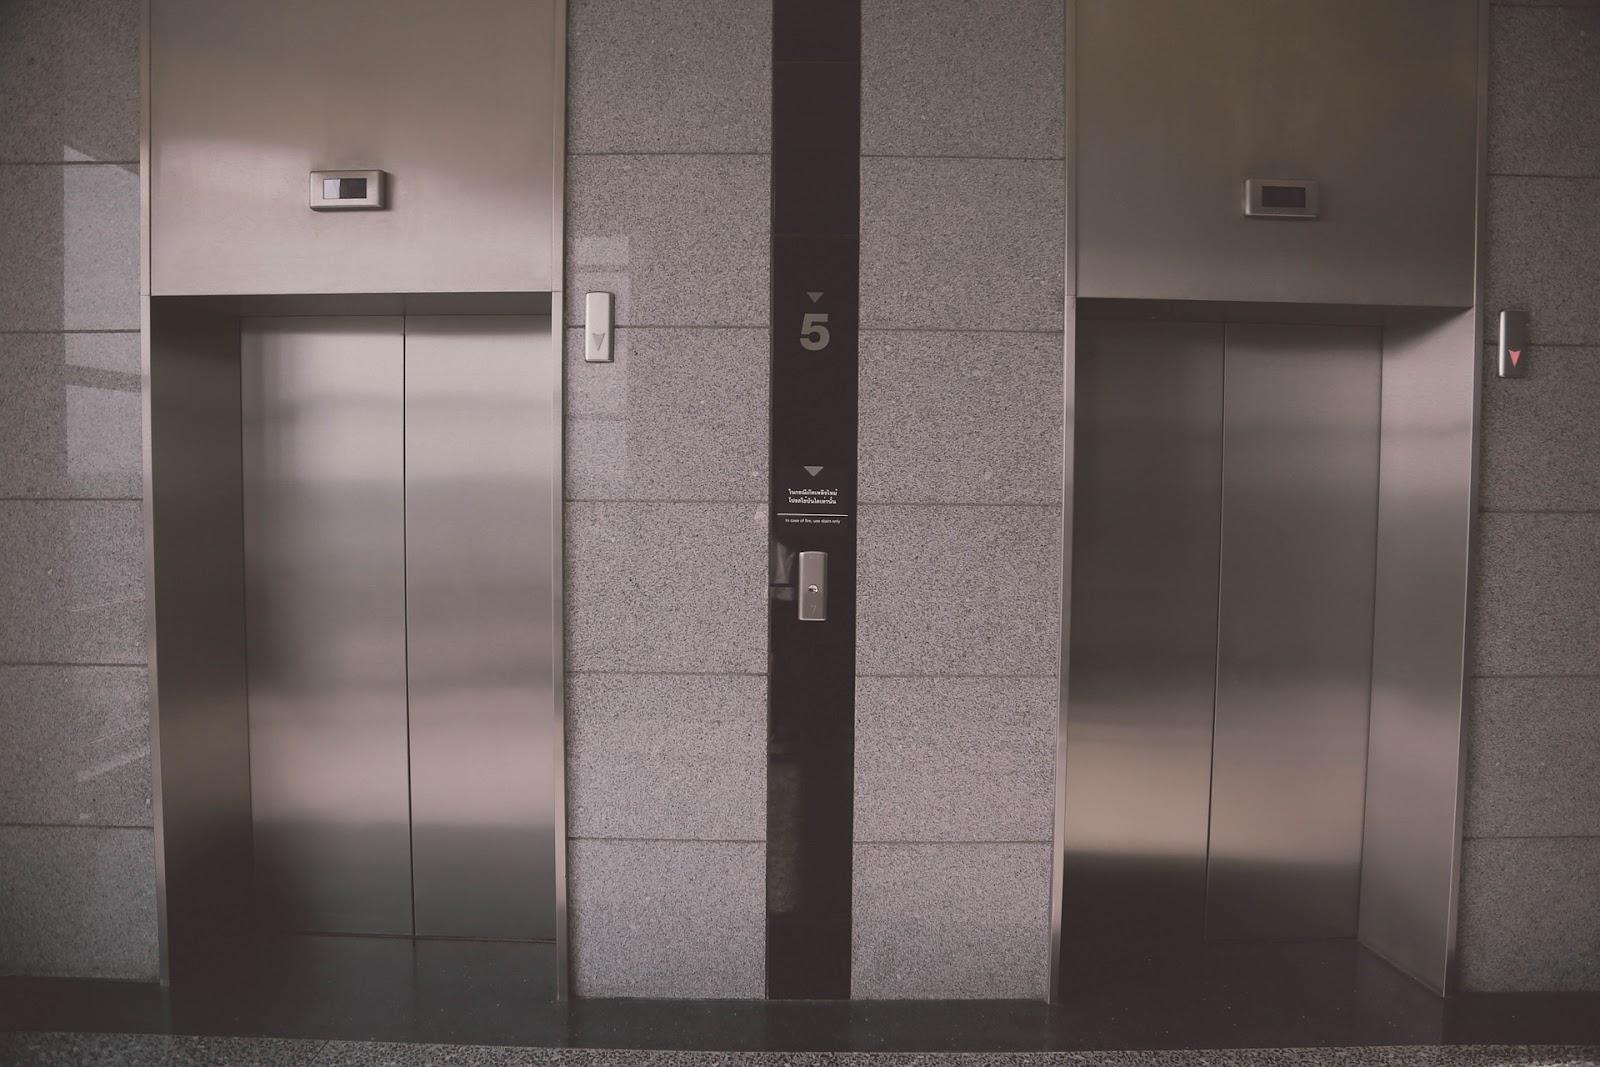 g4Qc8SGffy rzIDrHQsYjvufnC7jJncluMnkGttuS9naosUeFBVK1QyIHqXmgp53eYnZaexJSVwhb5x7y5sSEJEpph70vOso6BG6rNq7tux18XRMHcRW QmImScDWCyk8DII6DWW - Tipos de ascensores para su edificio